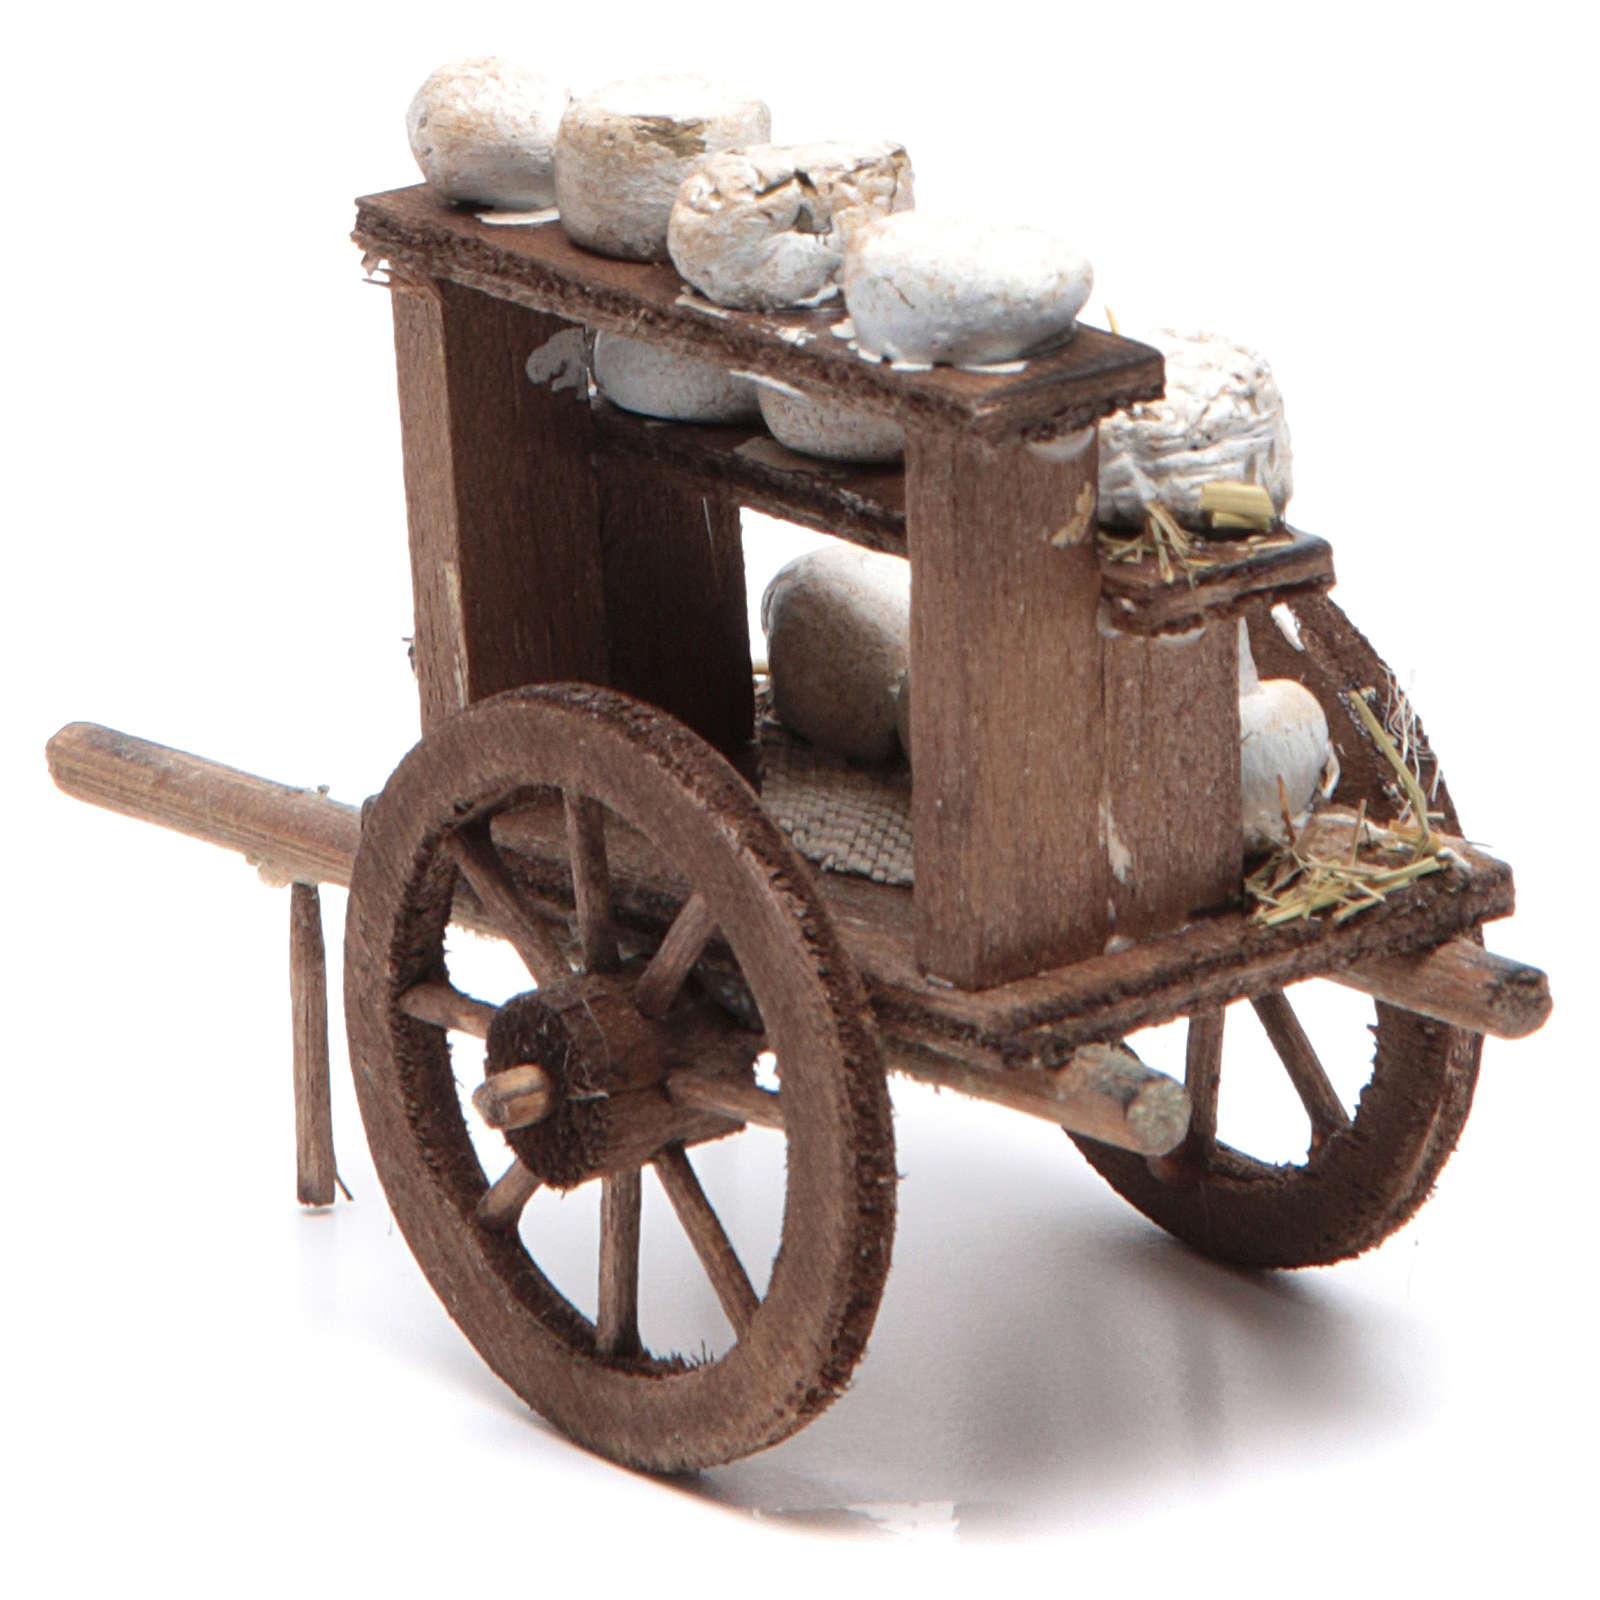 Neapolitan Nativity accessory: cheese cart measuring 7x10x4cm 4